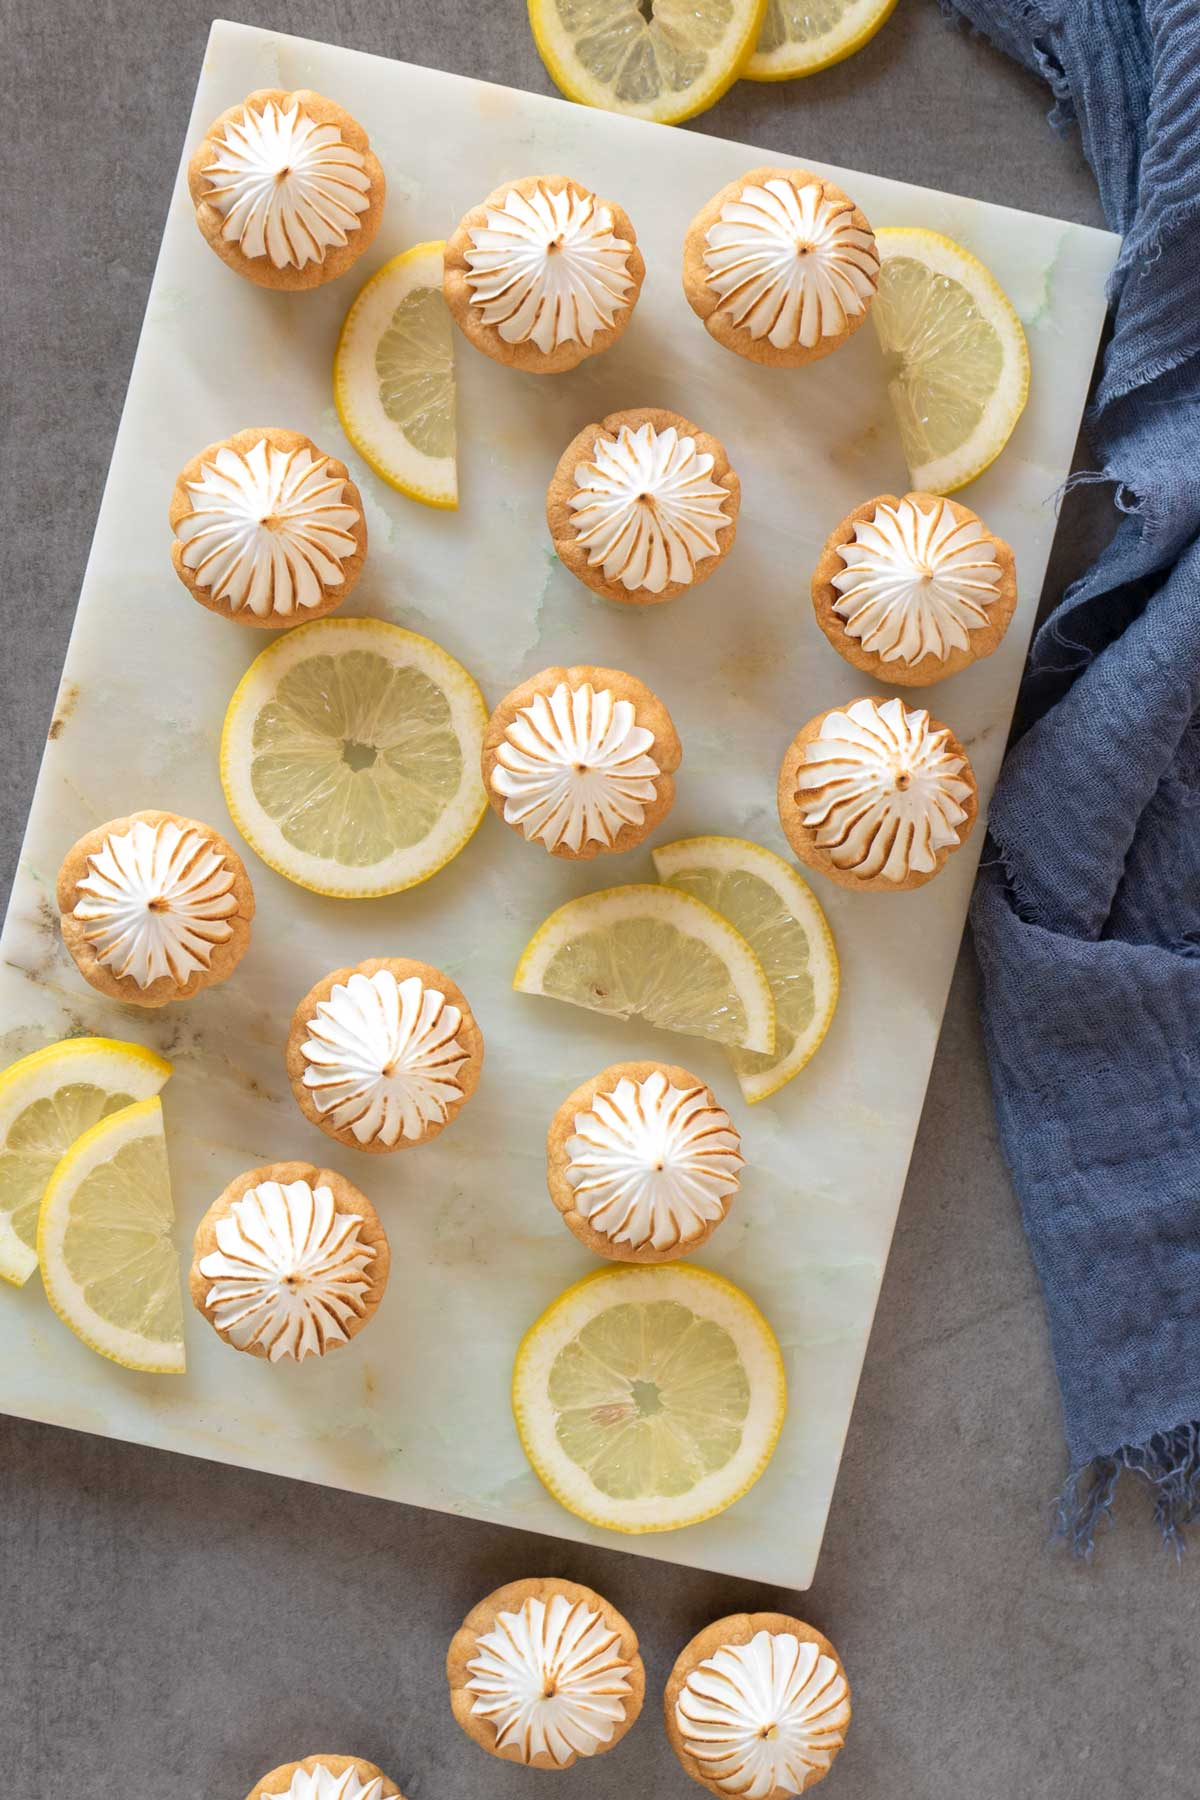 lemon meringue pie bites and lemon slices on a marble table